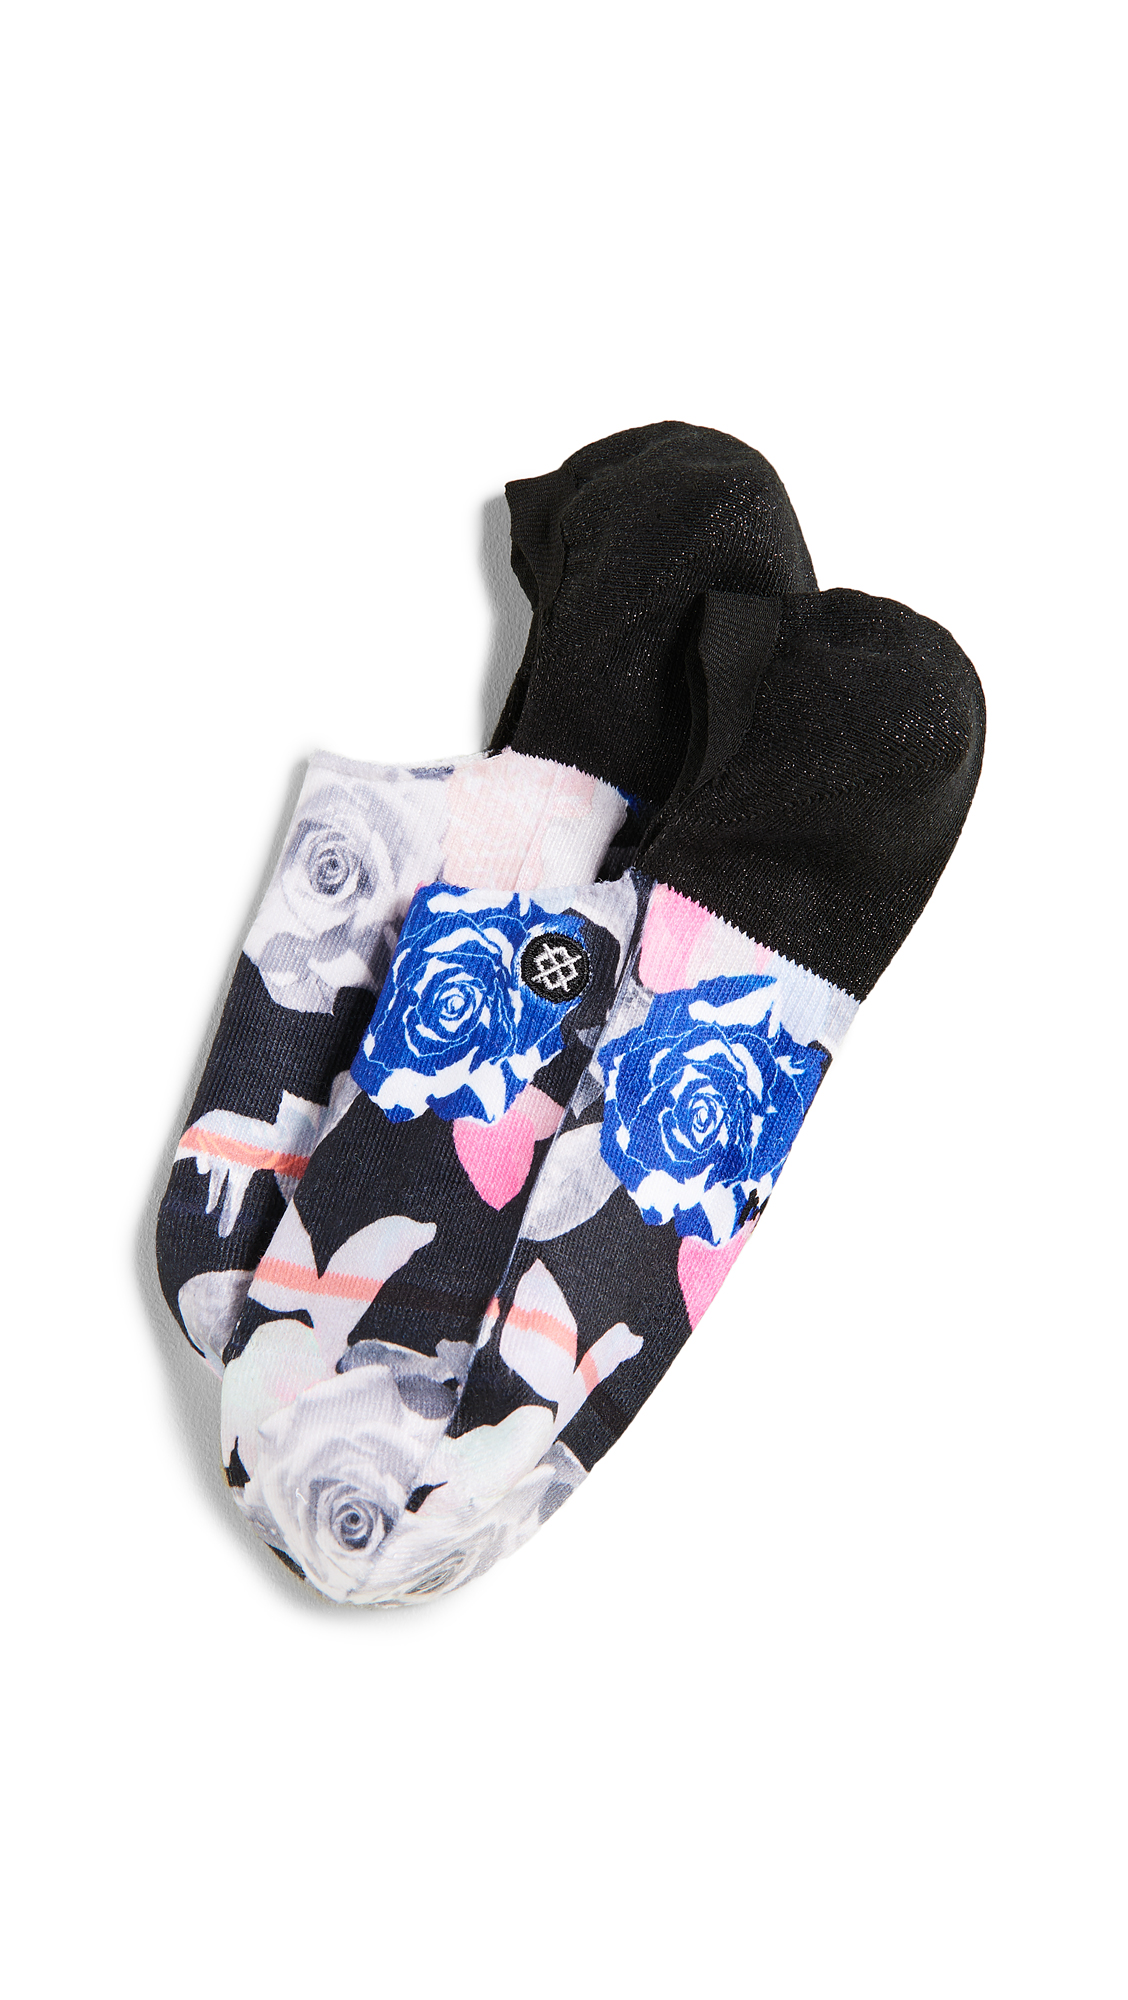 STANCE Splendid Invisible Socks - Black